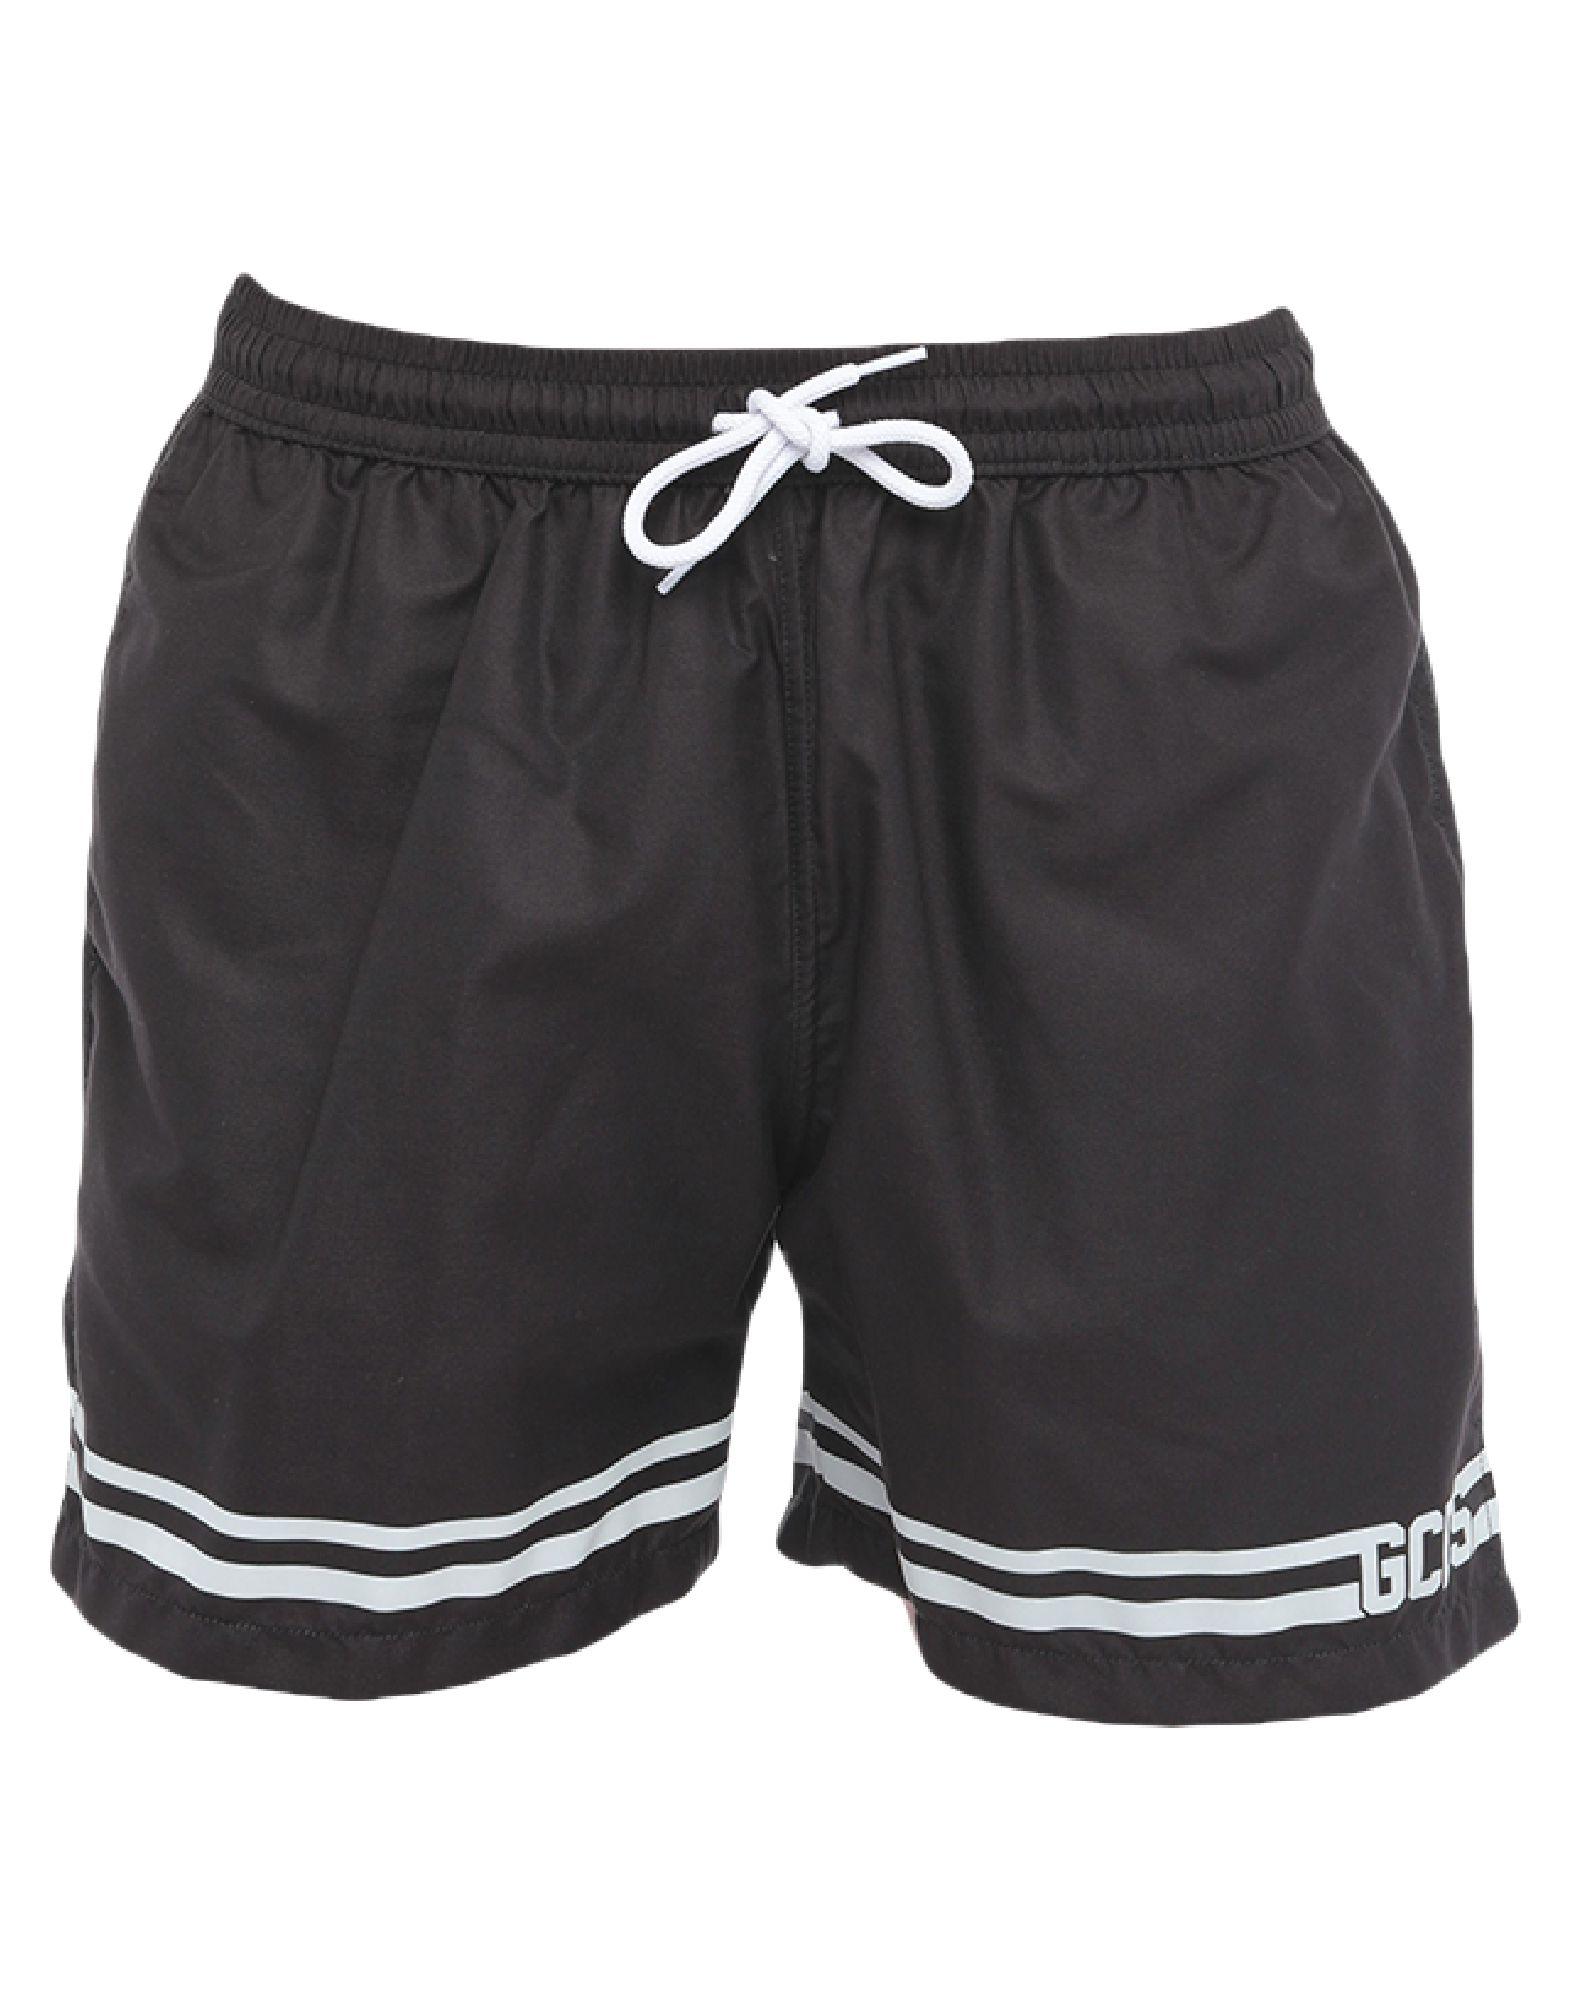 GCDS Swim trunks. techno fabric, logo, solid color, multipockets, drawstring closure, internal slip. 100% Polyester